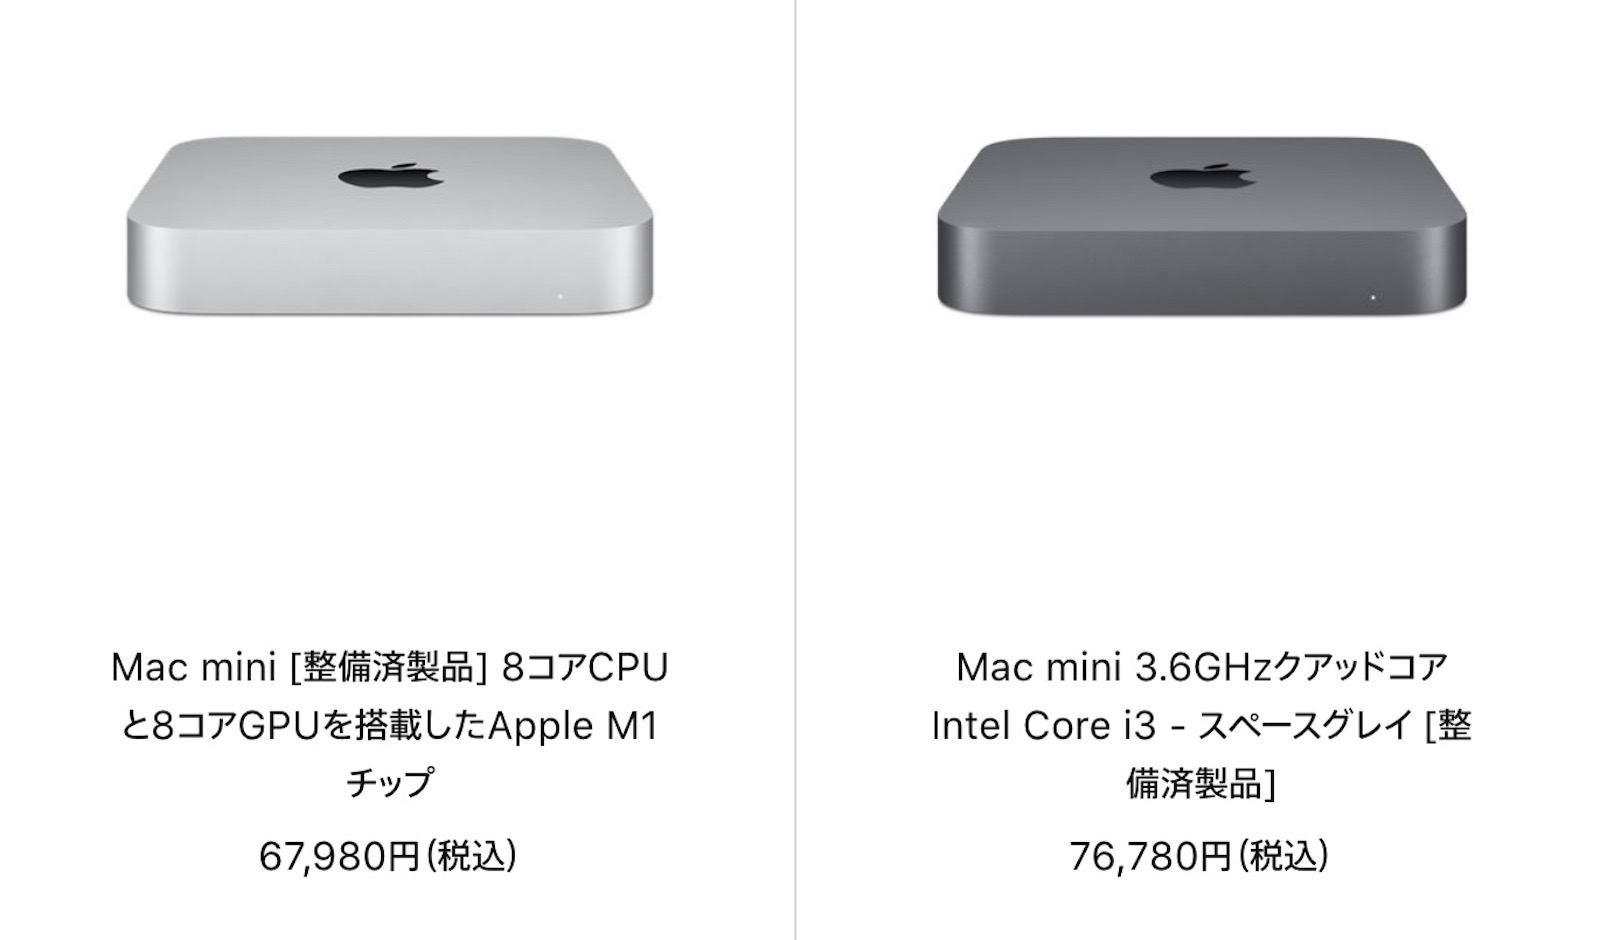 M1 mac mini refurbished model